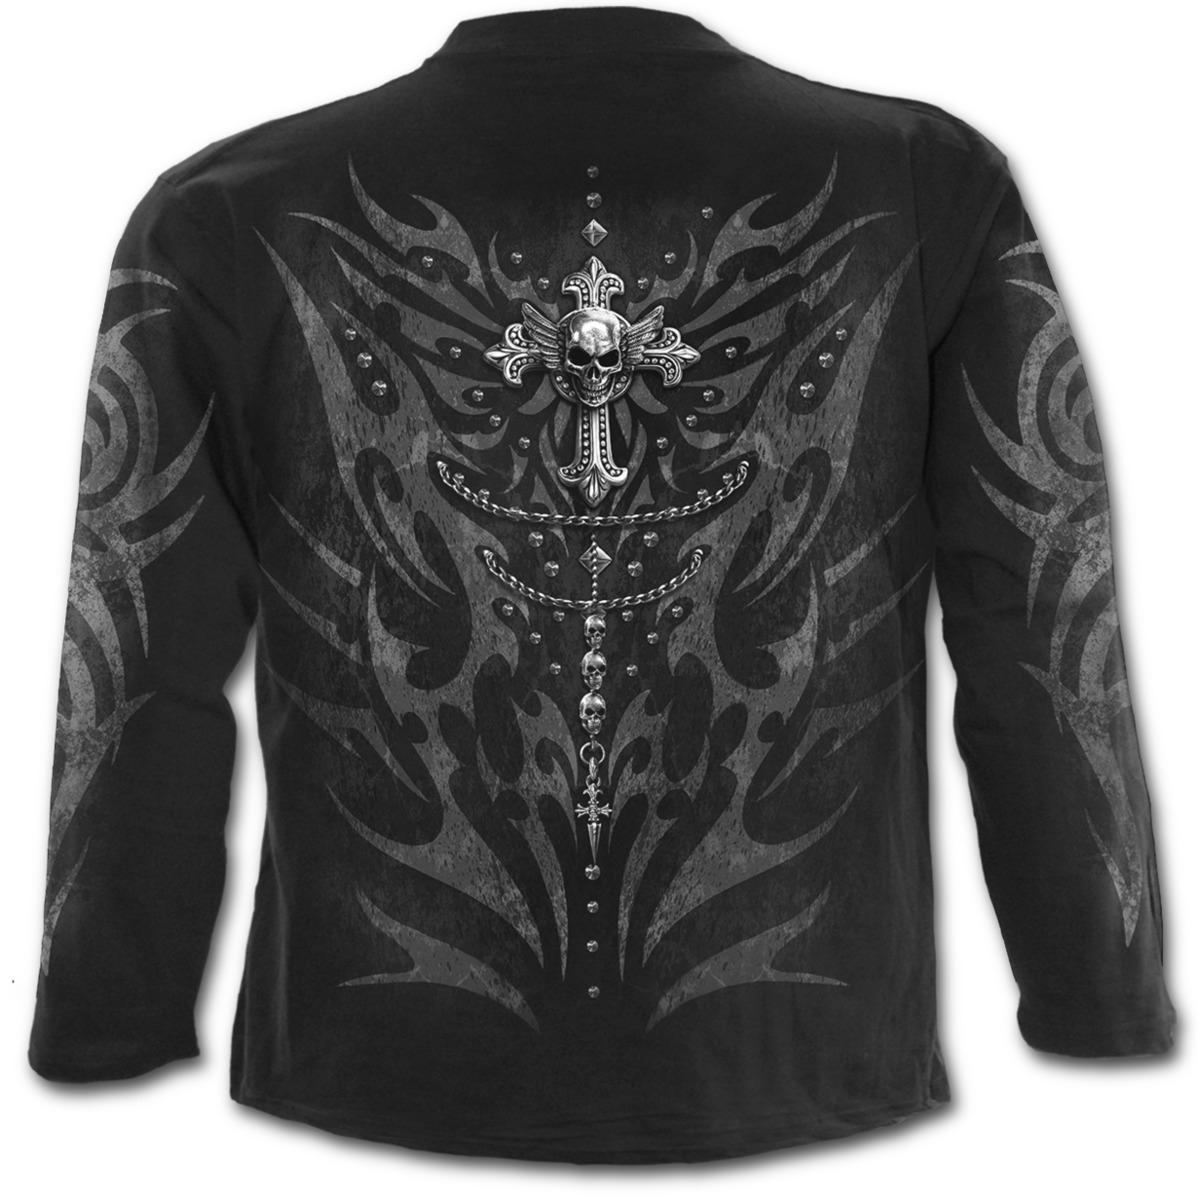 rebelsmarket_longsleeve_t_shirt_black_t_shirts_3.jpg